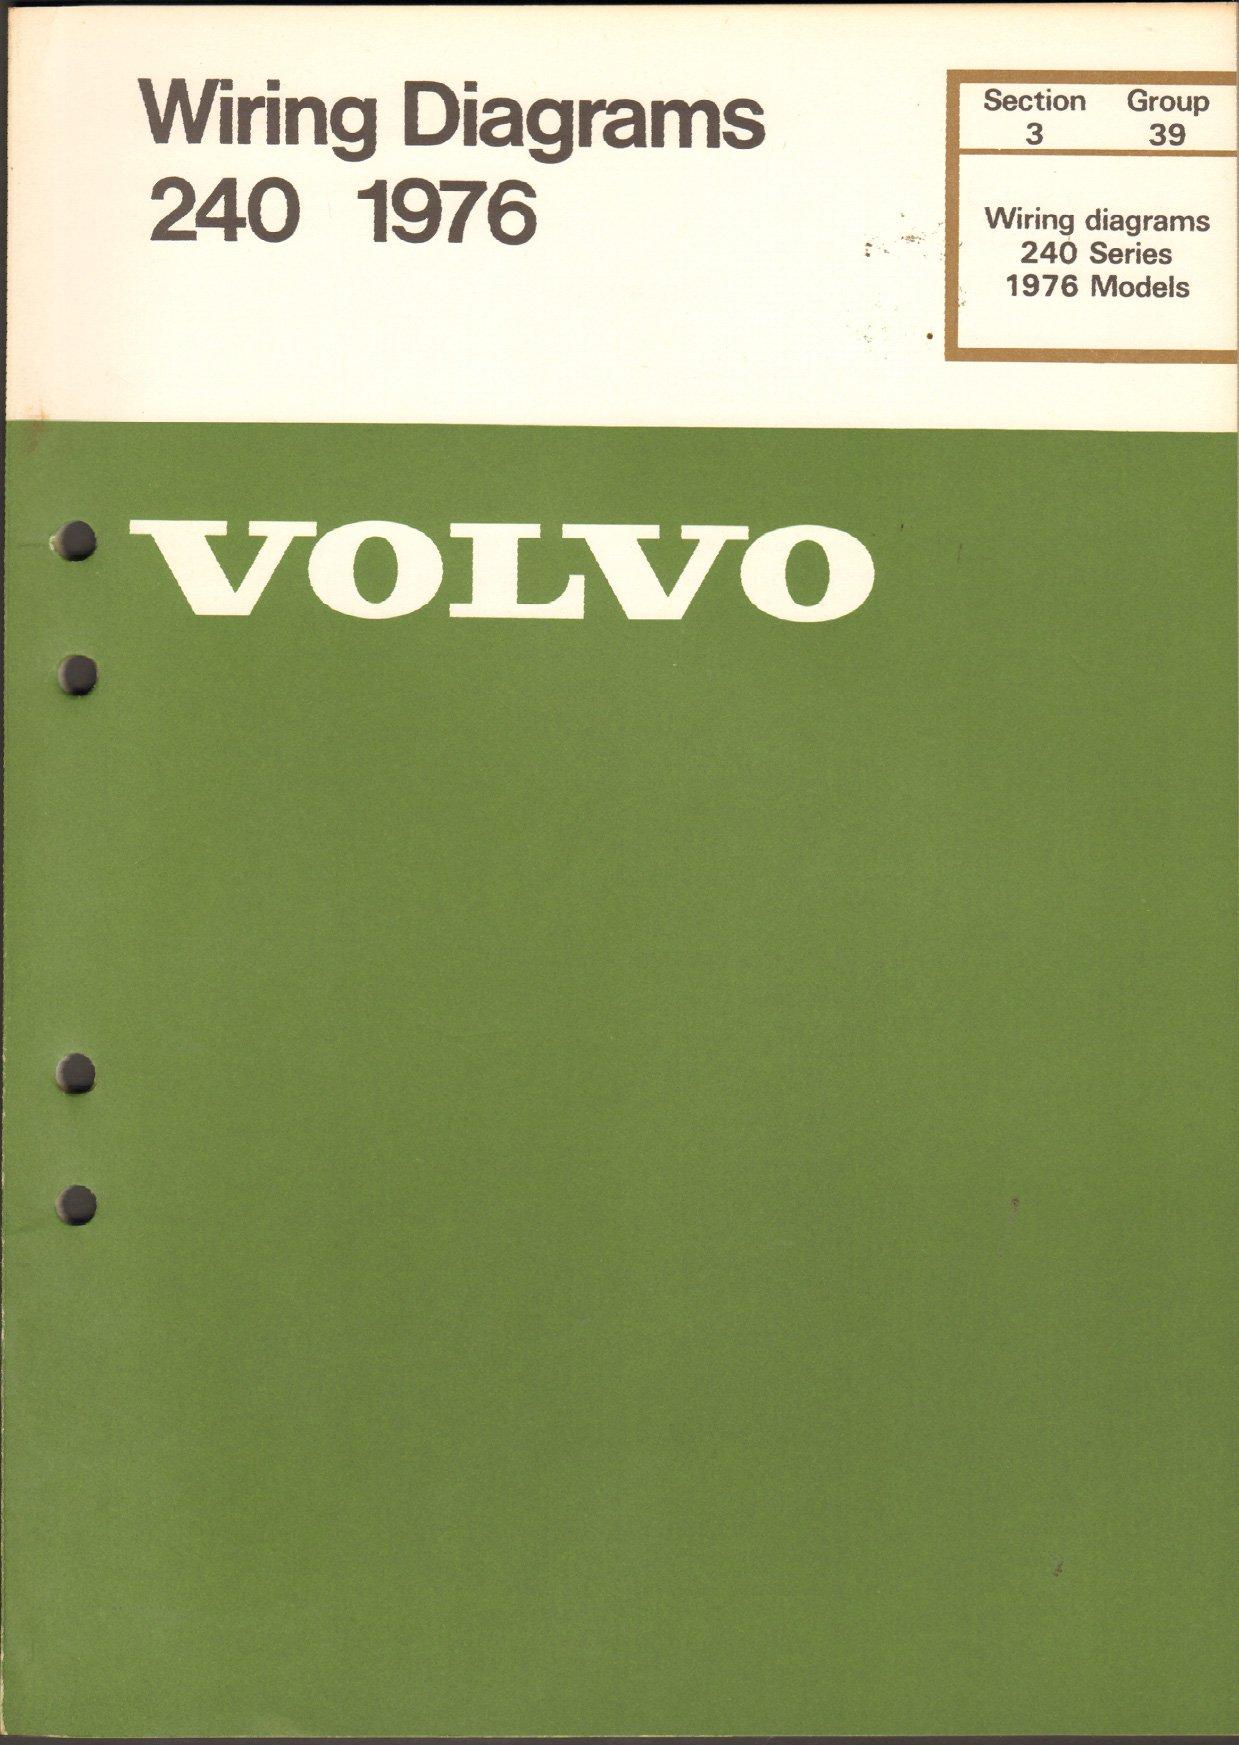 Volvo Wiring Diagrams 240 Series 1976 Model: Volvo: Amazon.com: Books | Volvo Amazon Wiring Diagram |  | Amazon.com